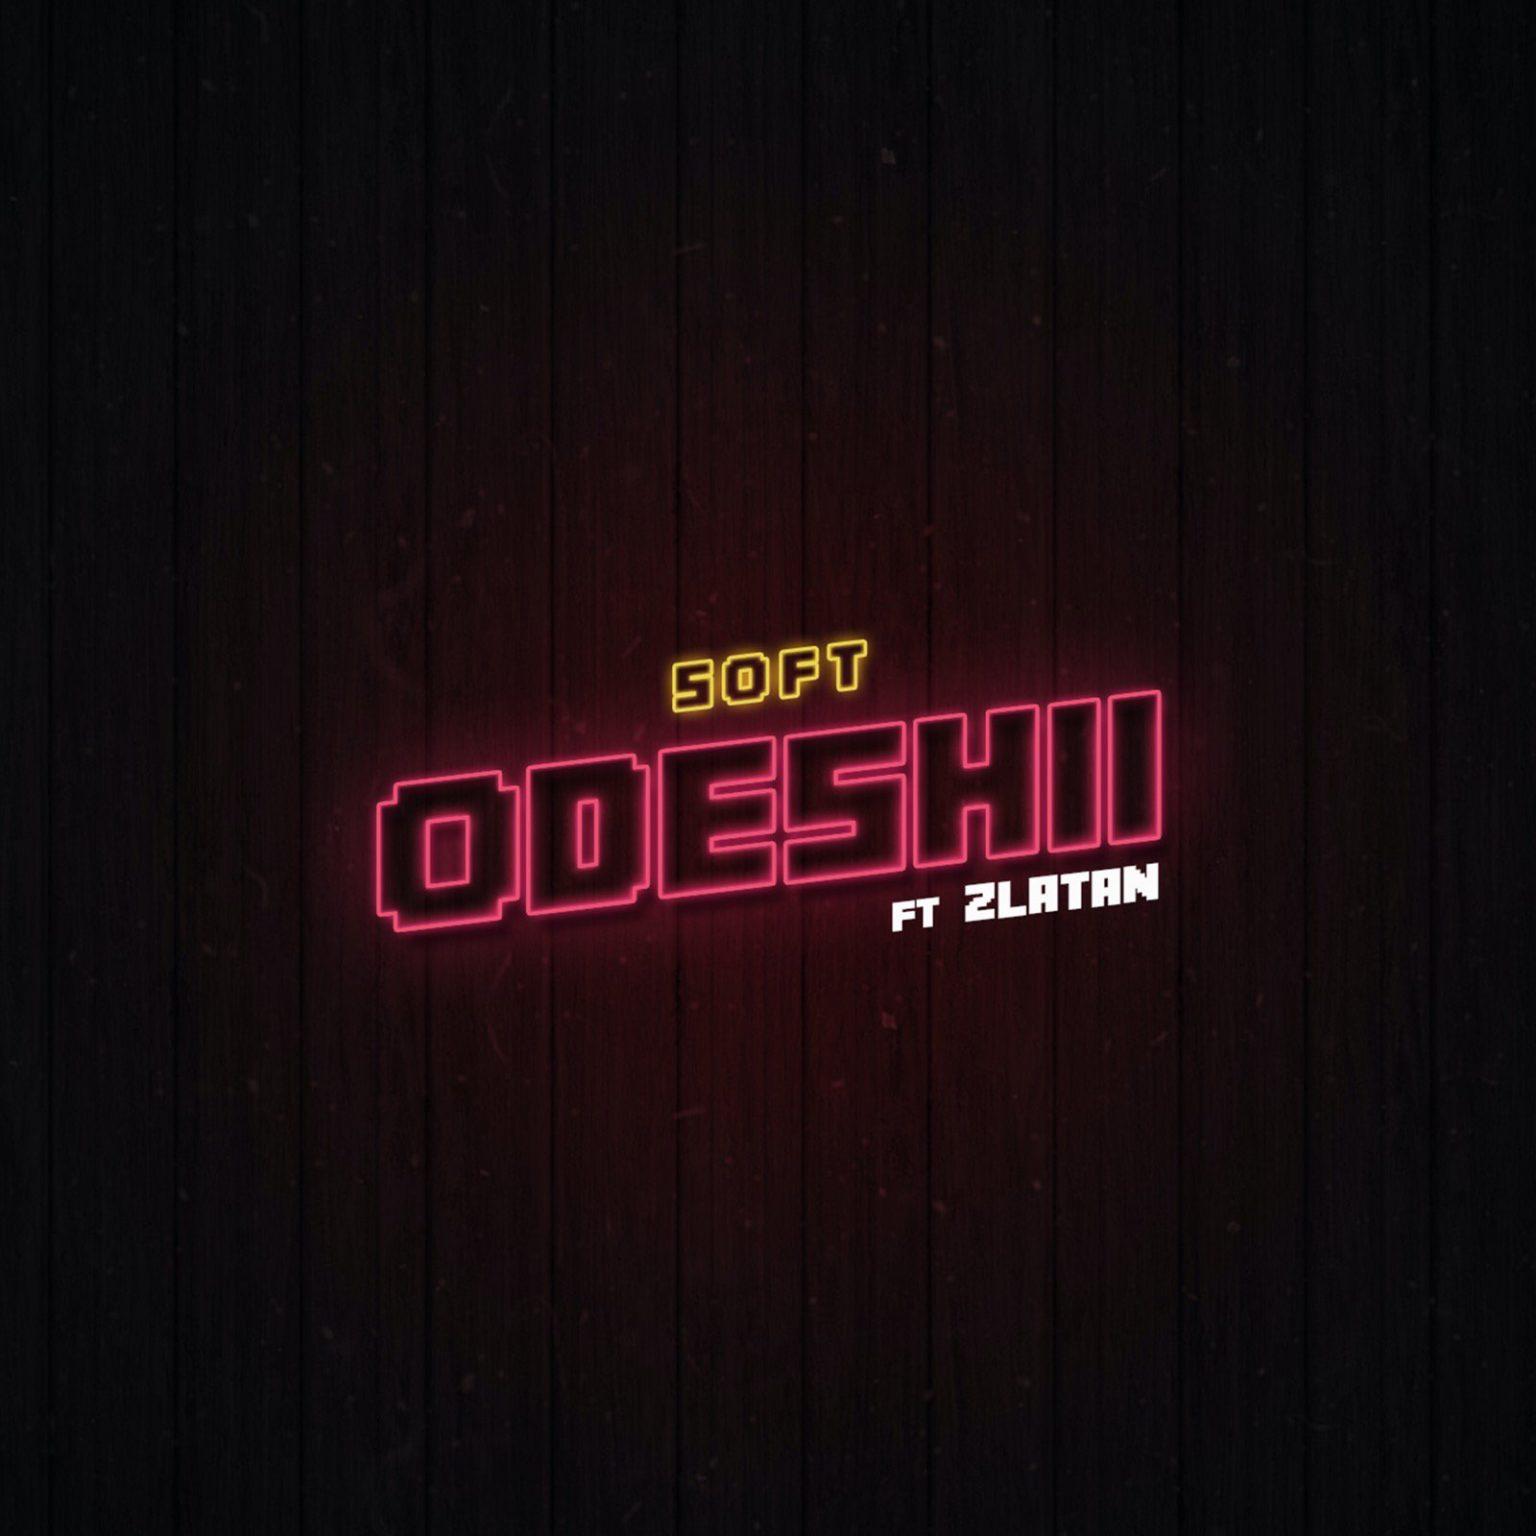 Soft Ft. Zlatan – Odeshi